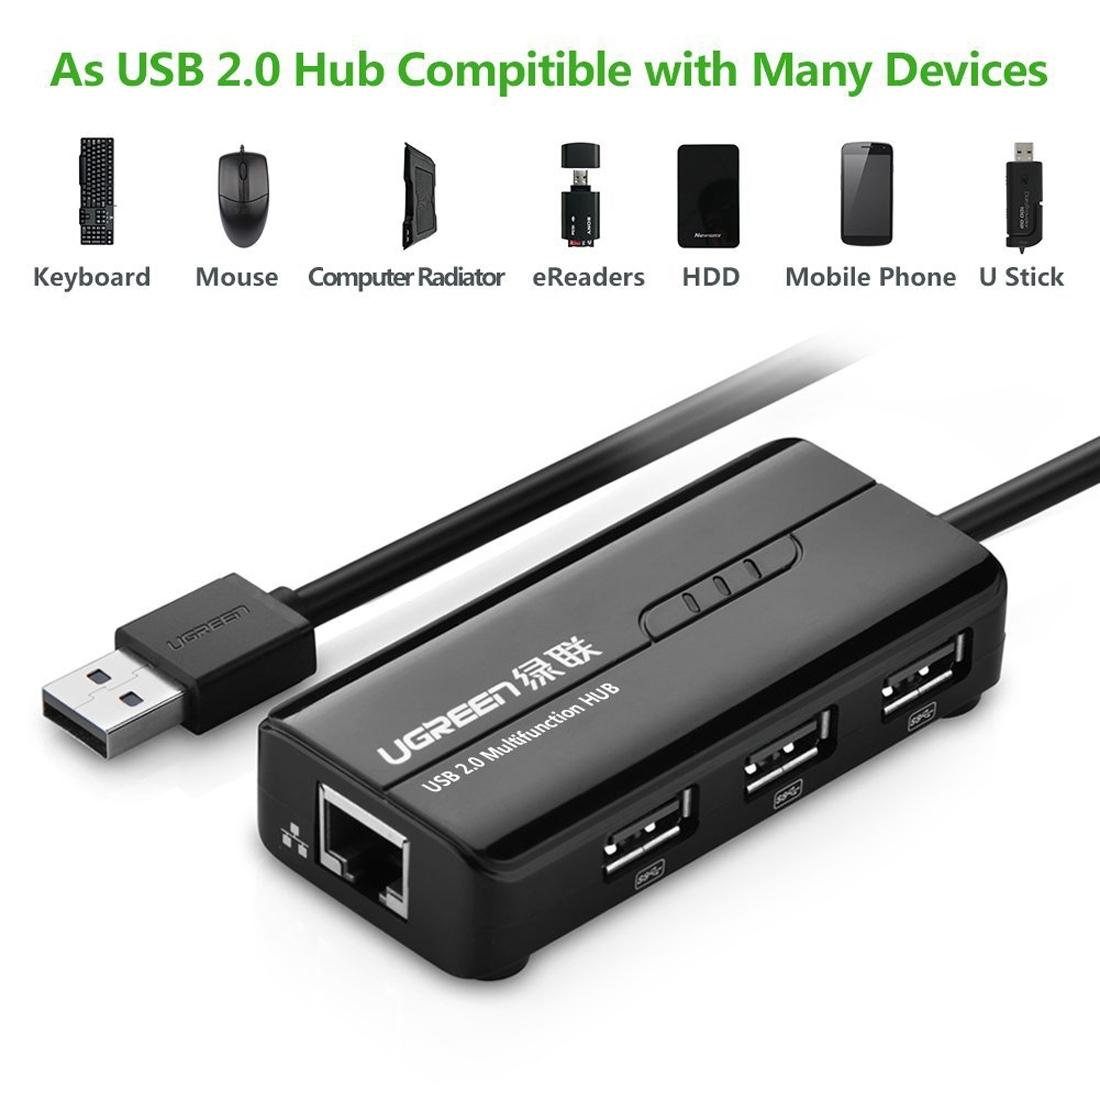 UGREEN 20264 3 Ports USB 2.0 HUB Splitter + 10/100Mbps RJ45 Ethernet Adapter for Mac, Windows, Linux Systems PC, 28cm